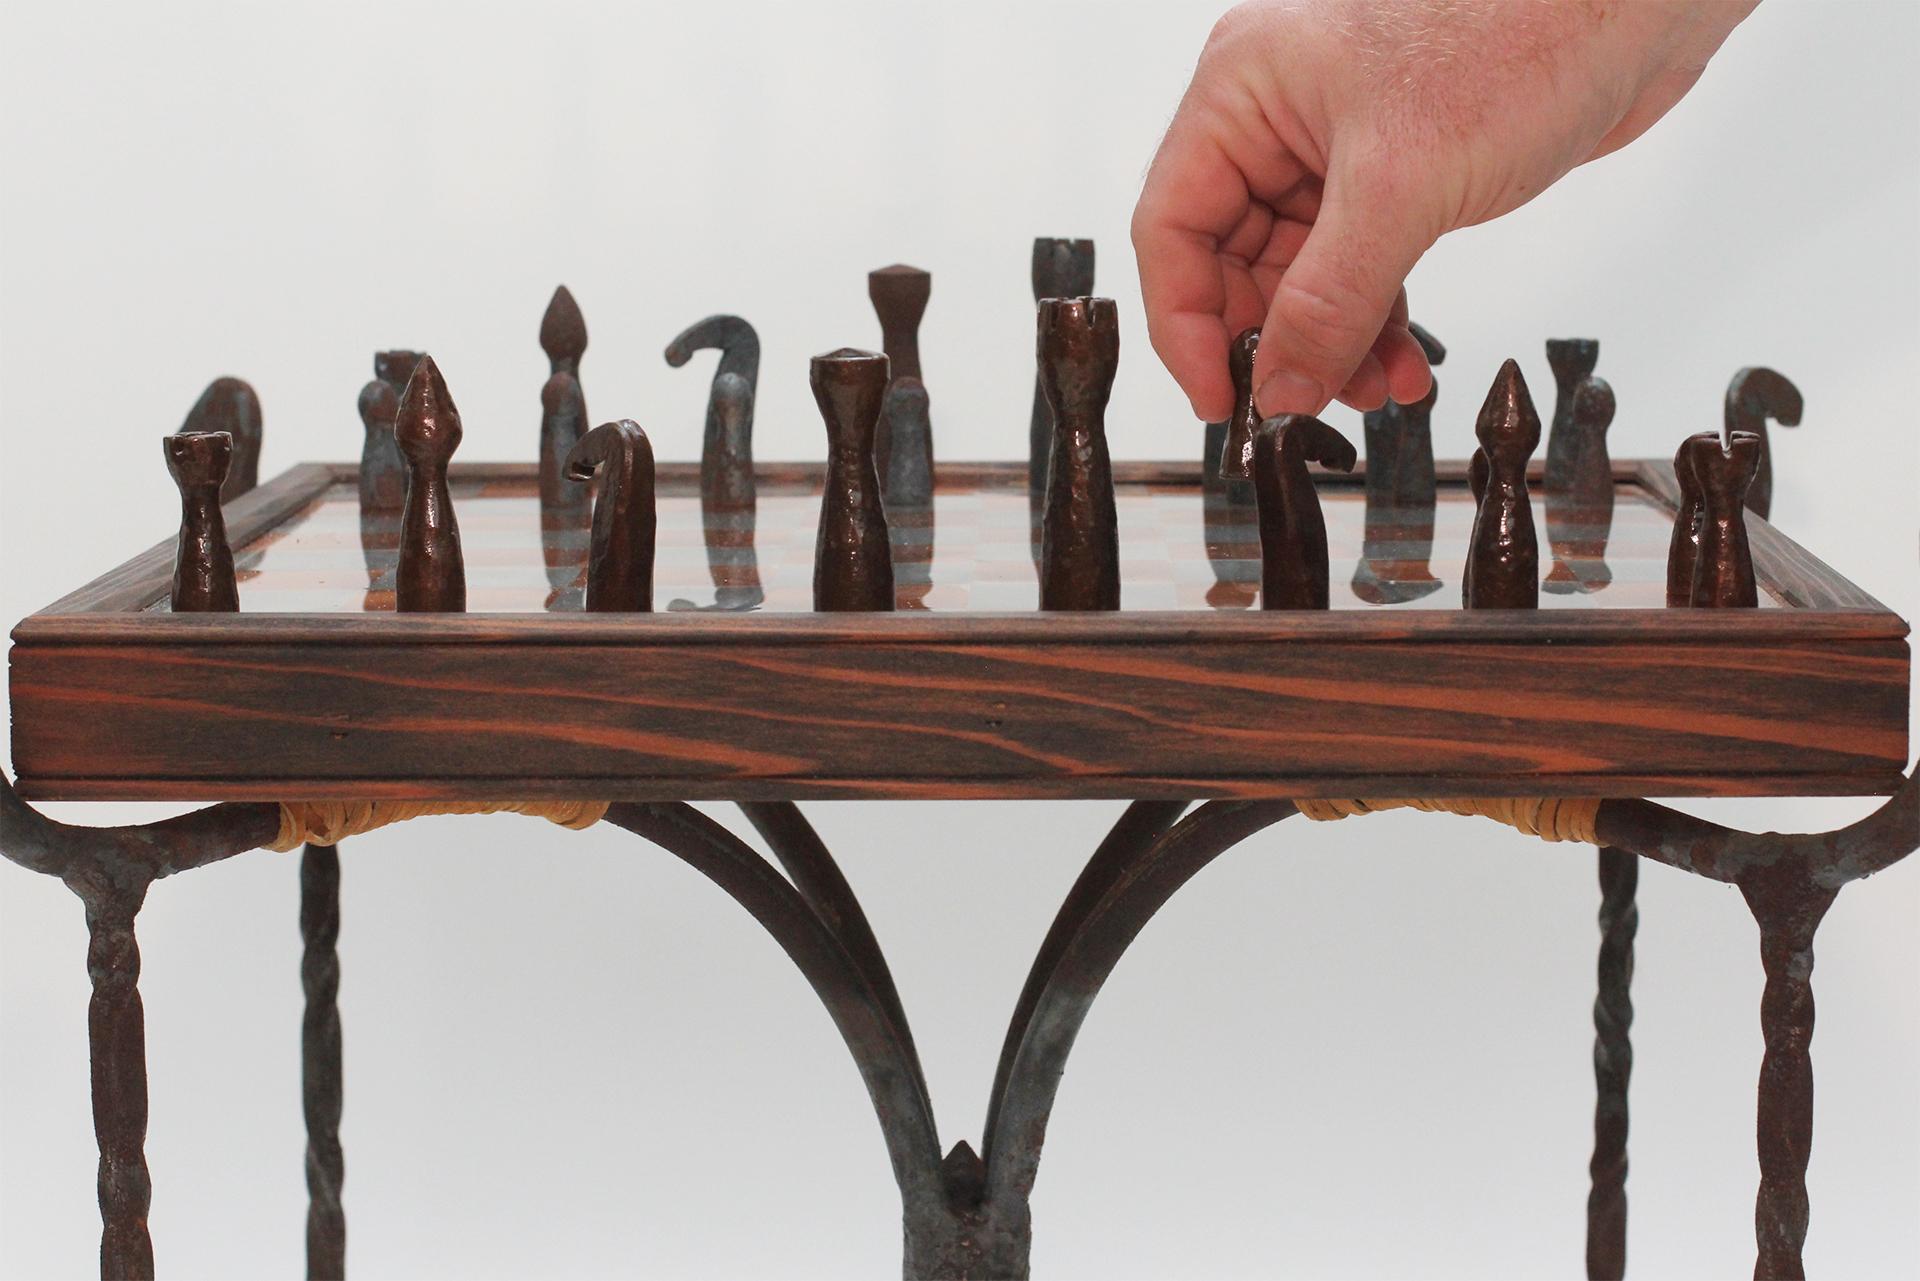 chessboardpieces-scale.jpg